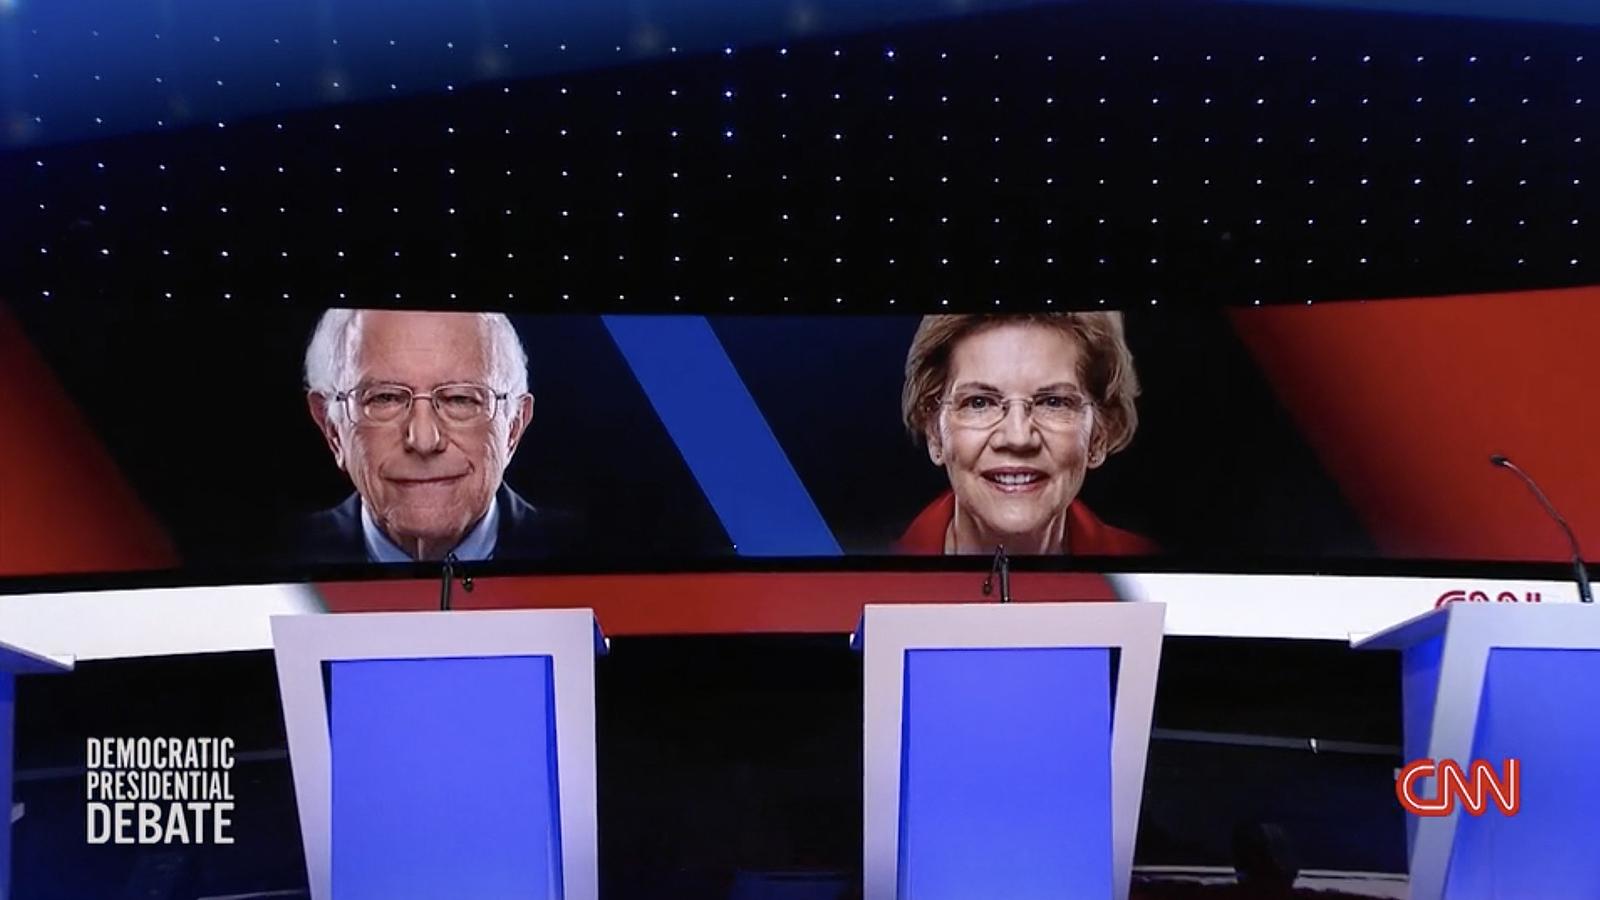 NCS_CNN-Dem-Debate-Cold-Open_Graphics_0006